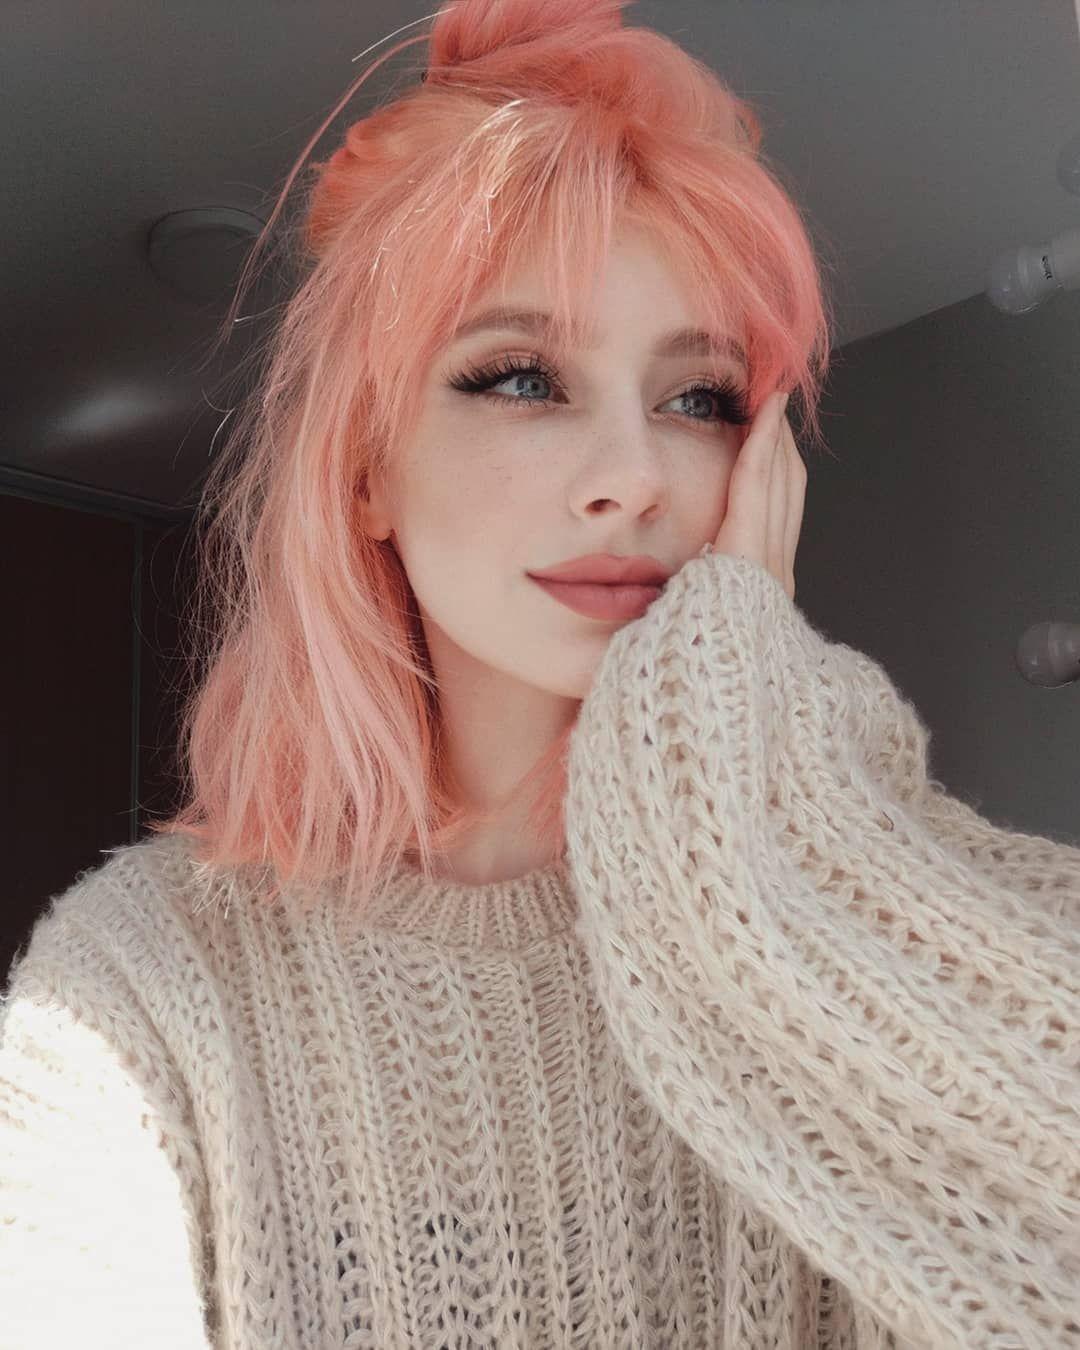 Pink Pinkhair Pinkhairstyle Pinkhairstyles Pink Hair Pink Hair Streaks Pink Hair Highlights Pink Hair Aesth In 2020 Peach Hair Bright Pink Hair Light Pink Hair